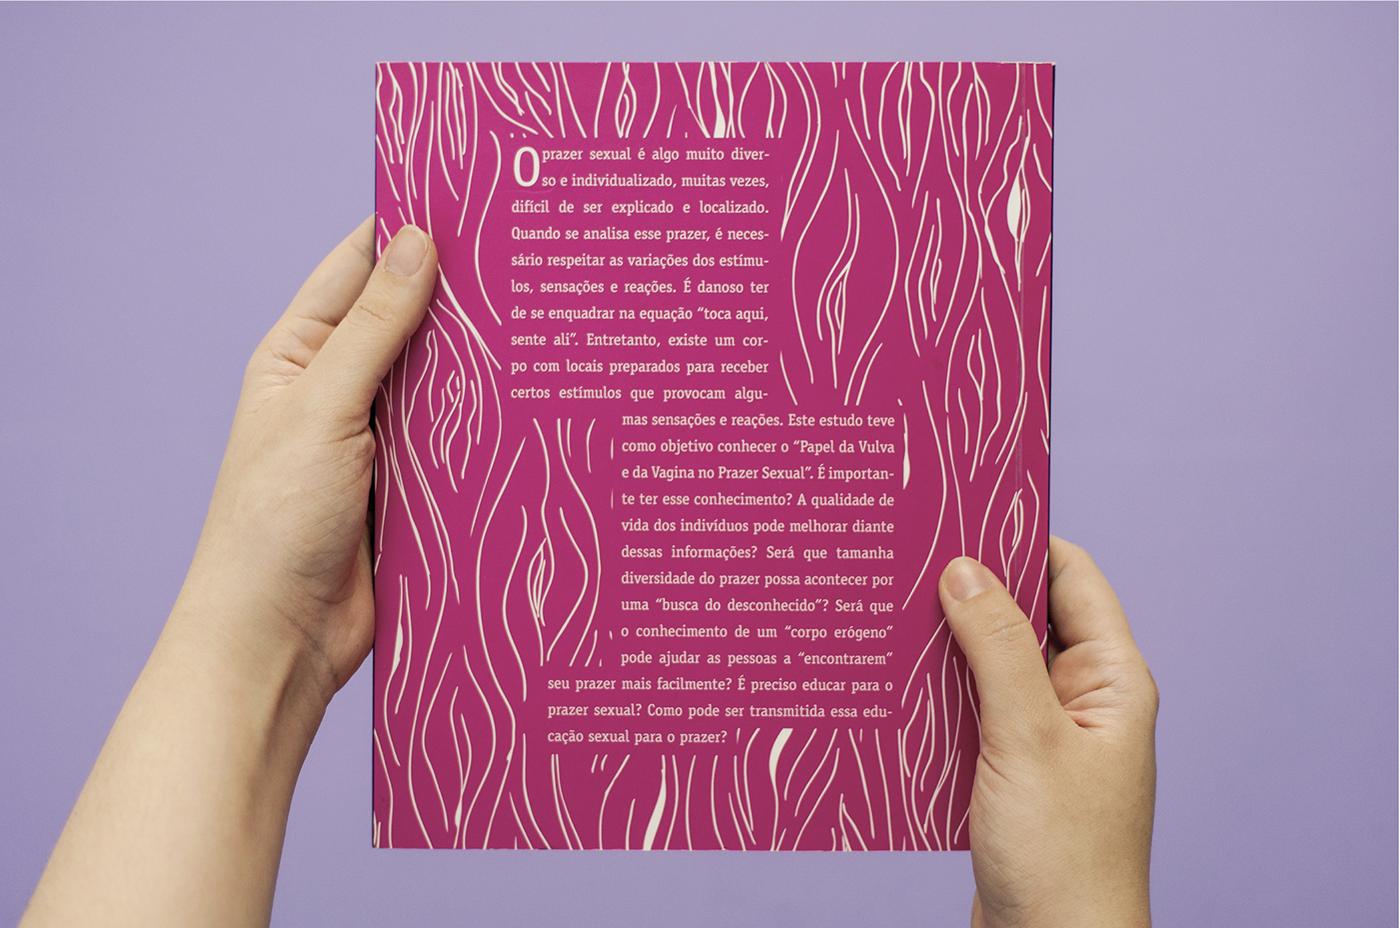 sexo vulva vagina editorial design  CMYK design editorial sexual prazer